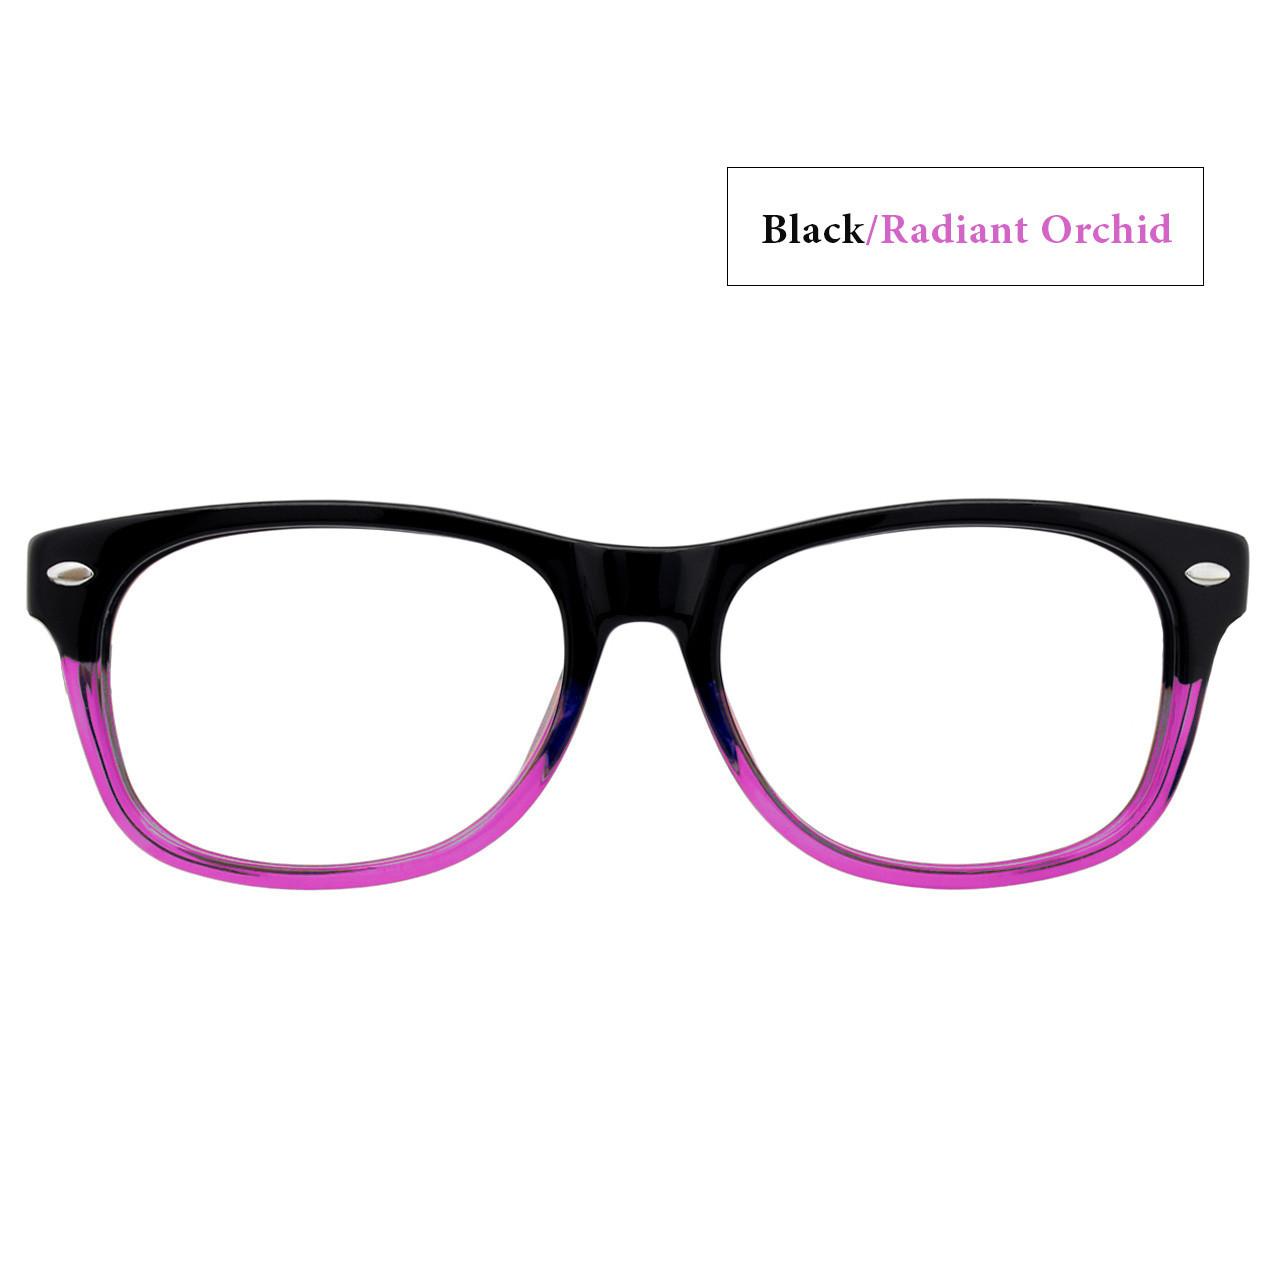 Black/Radiant Orchid